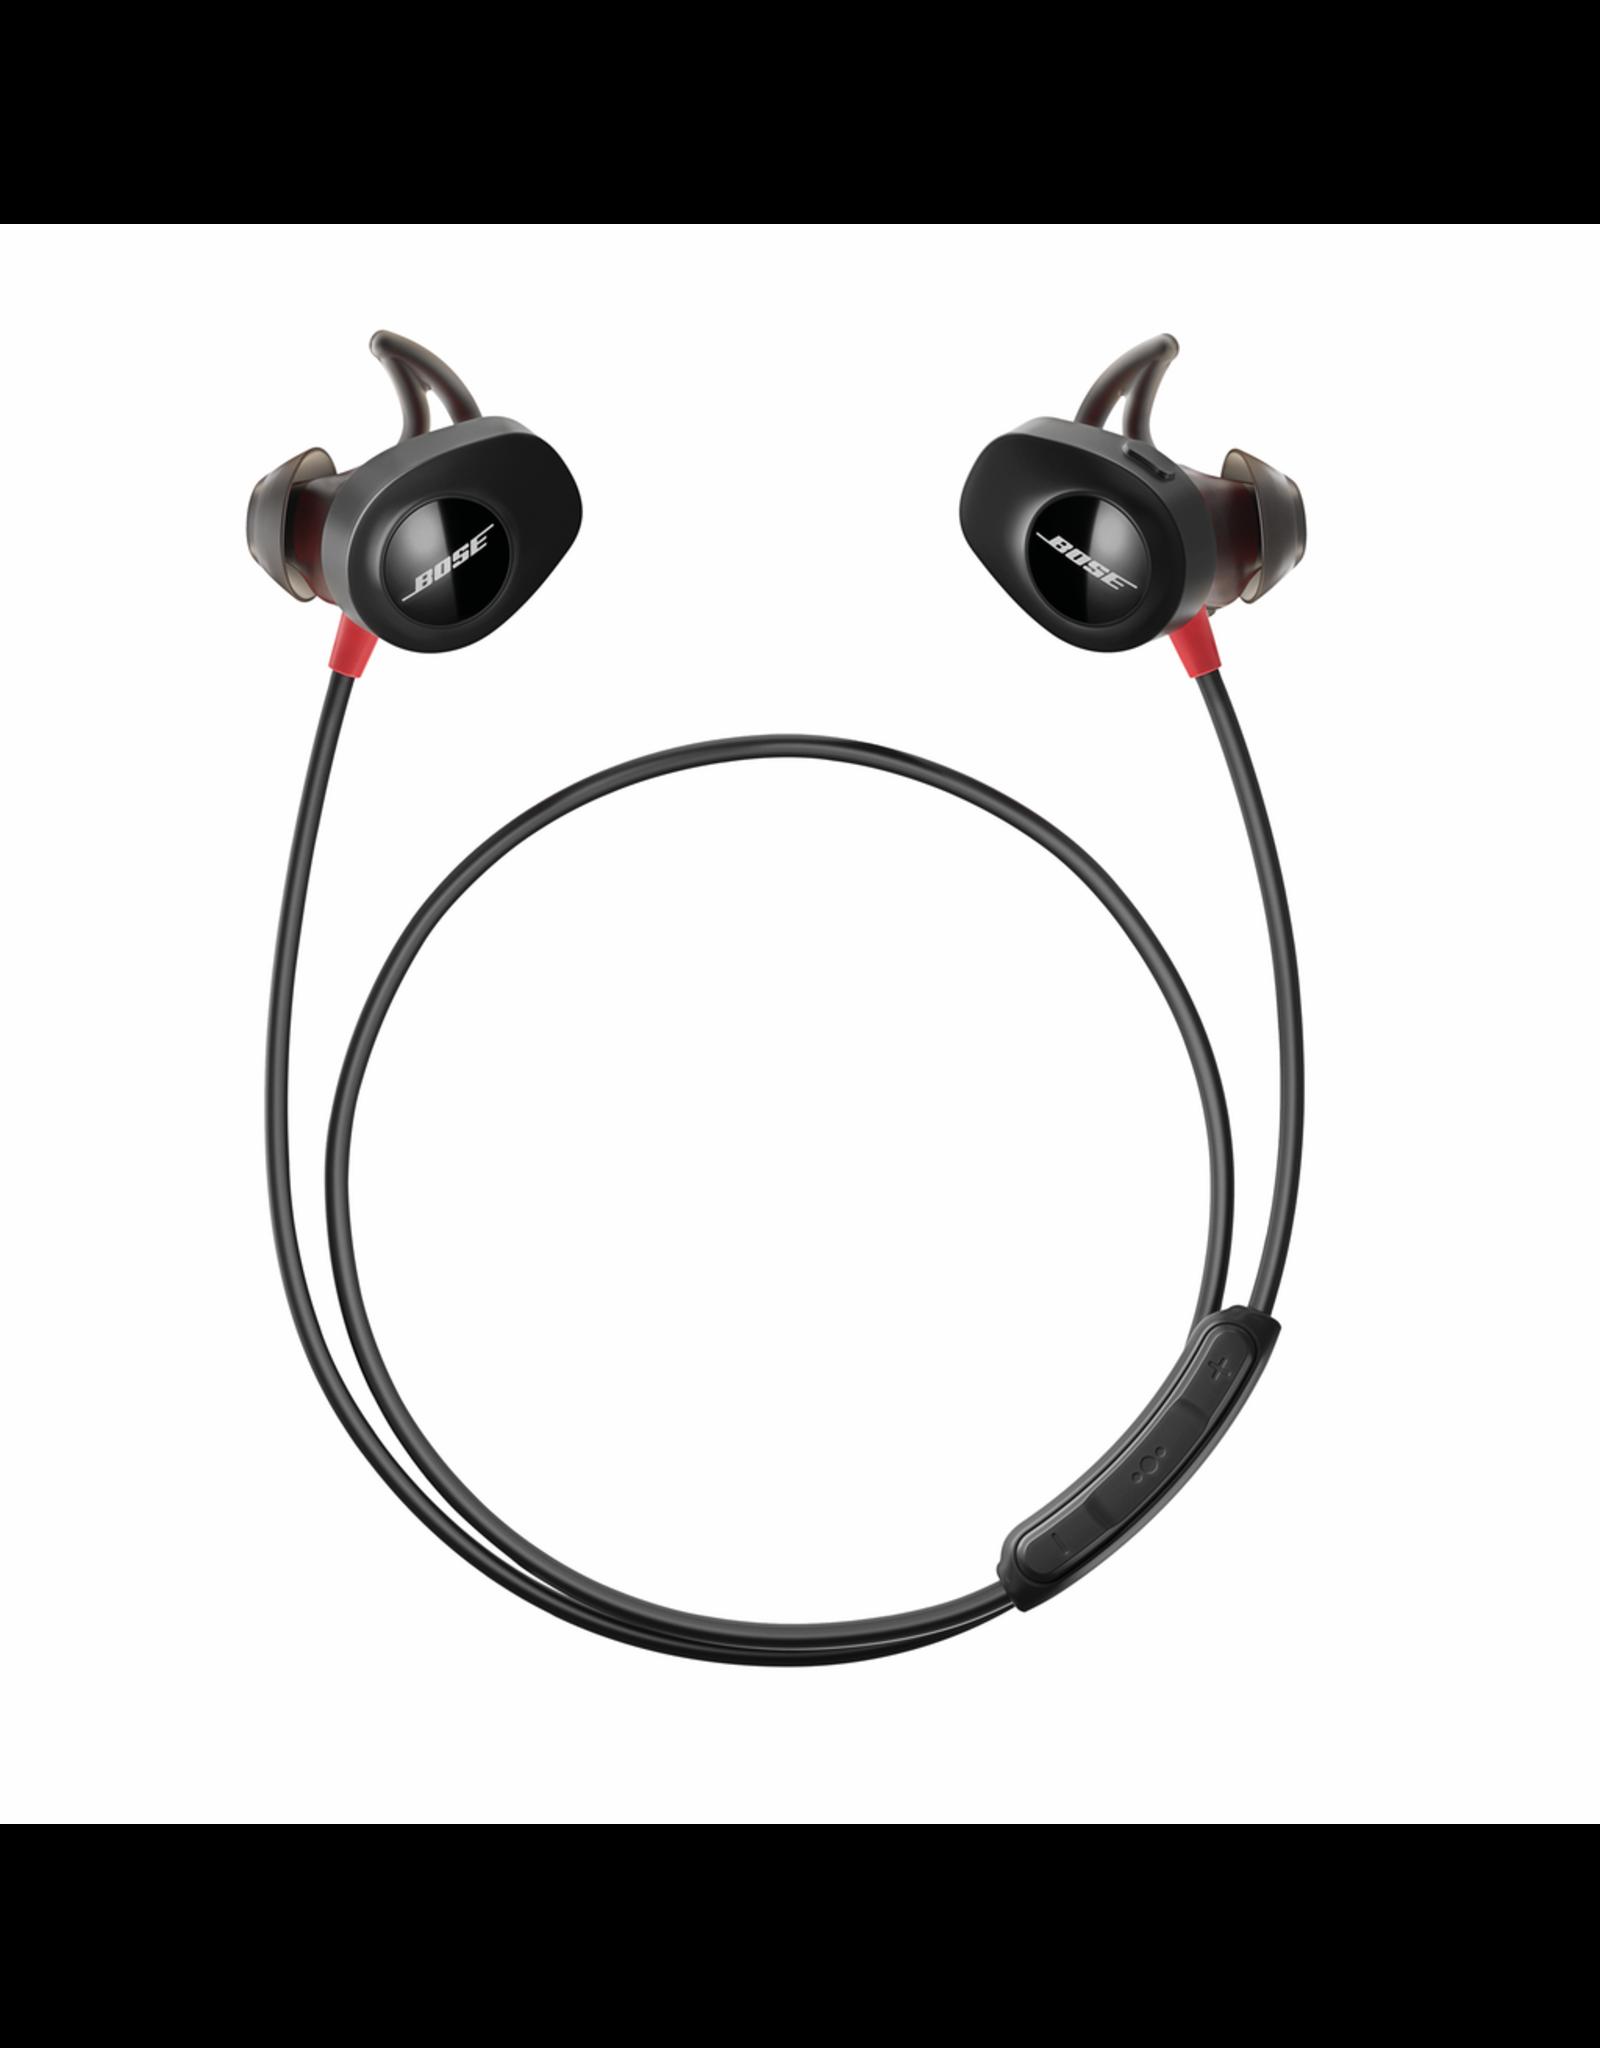 BOSE BOSE Soundsport PULSE Wireless Headphones, RED